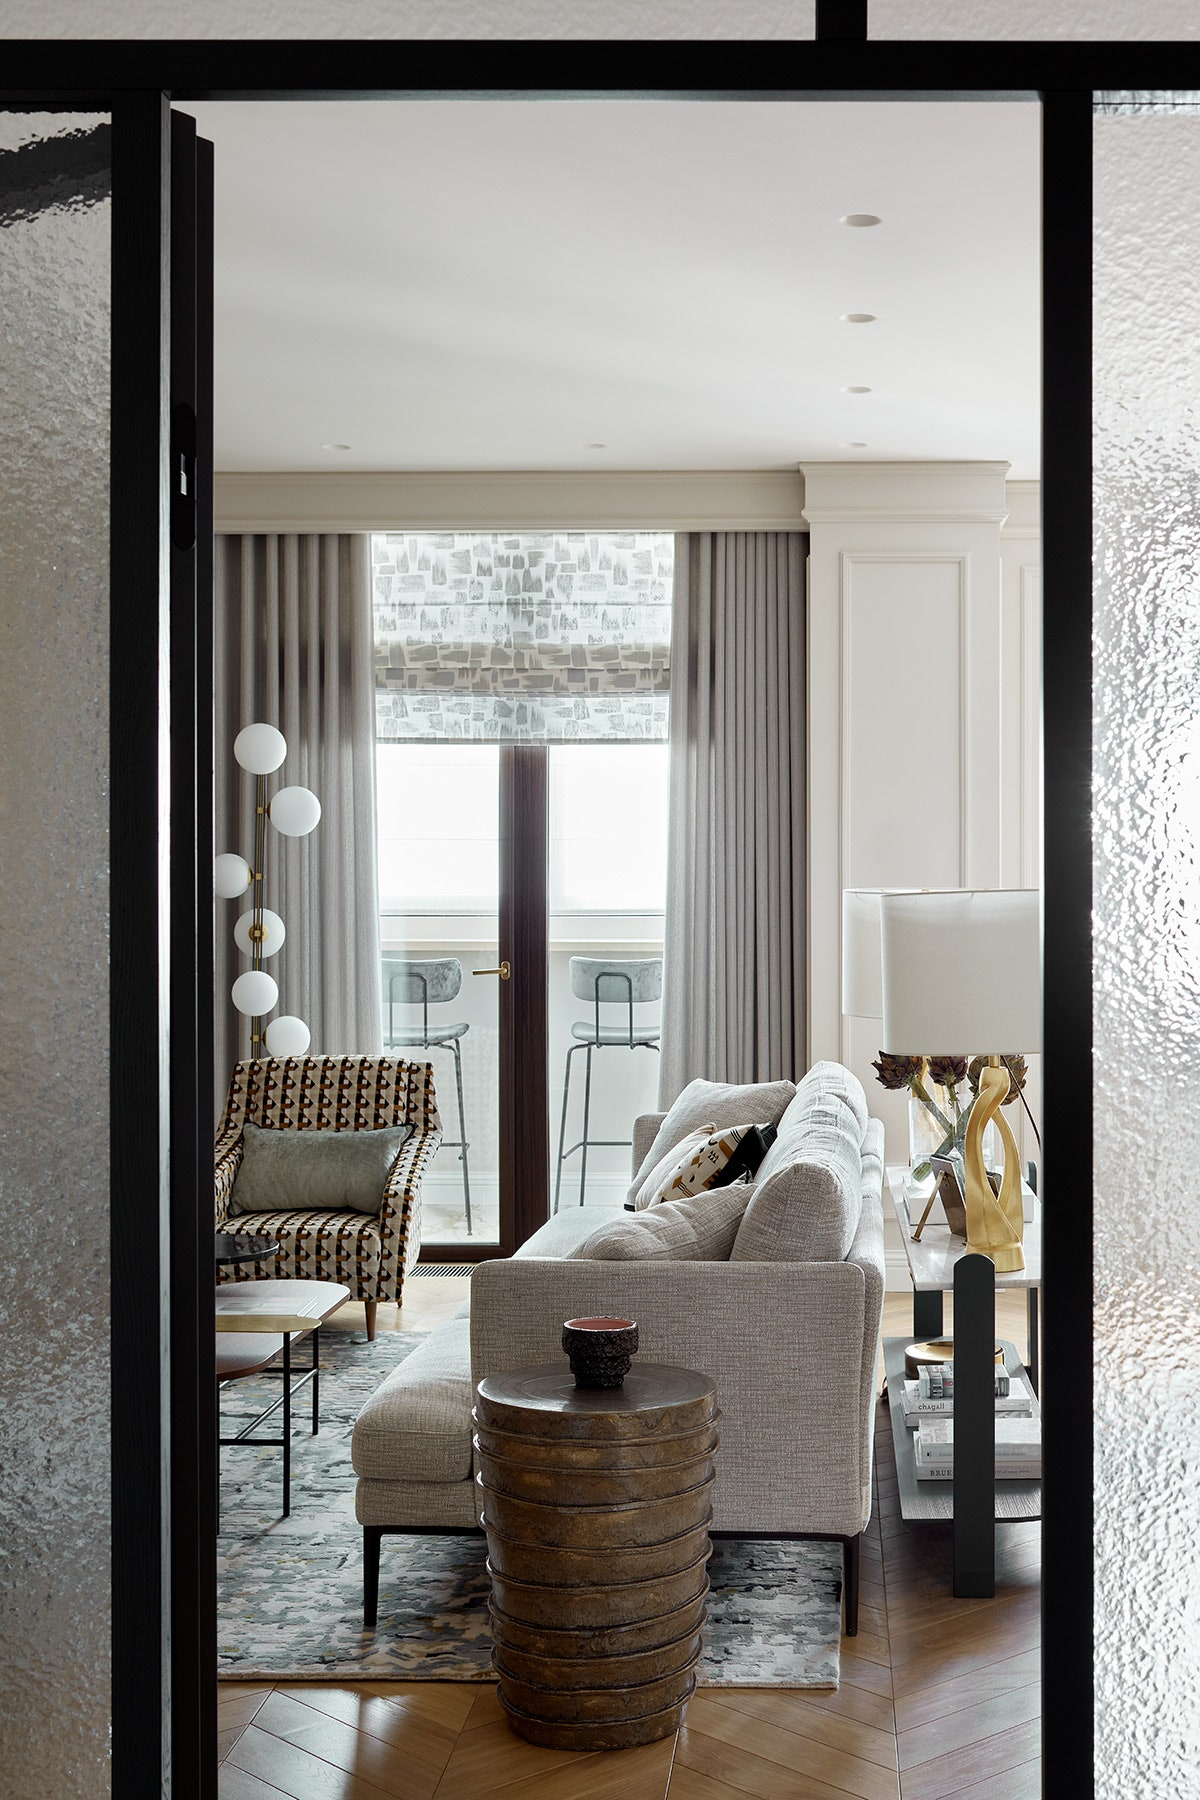 .  Zinc   Casamance   Savour Design  Gubi   Visual Comfort amp Co.  enere.it  Jerome Botanic.